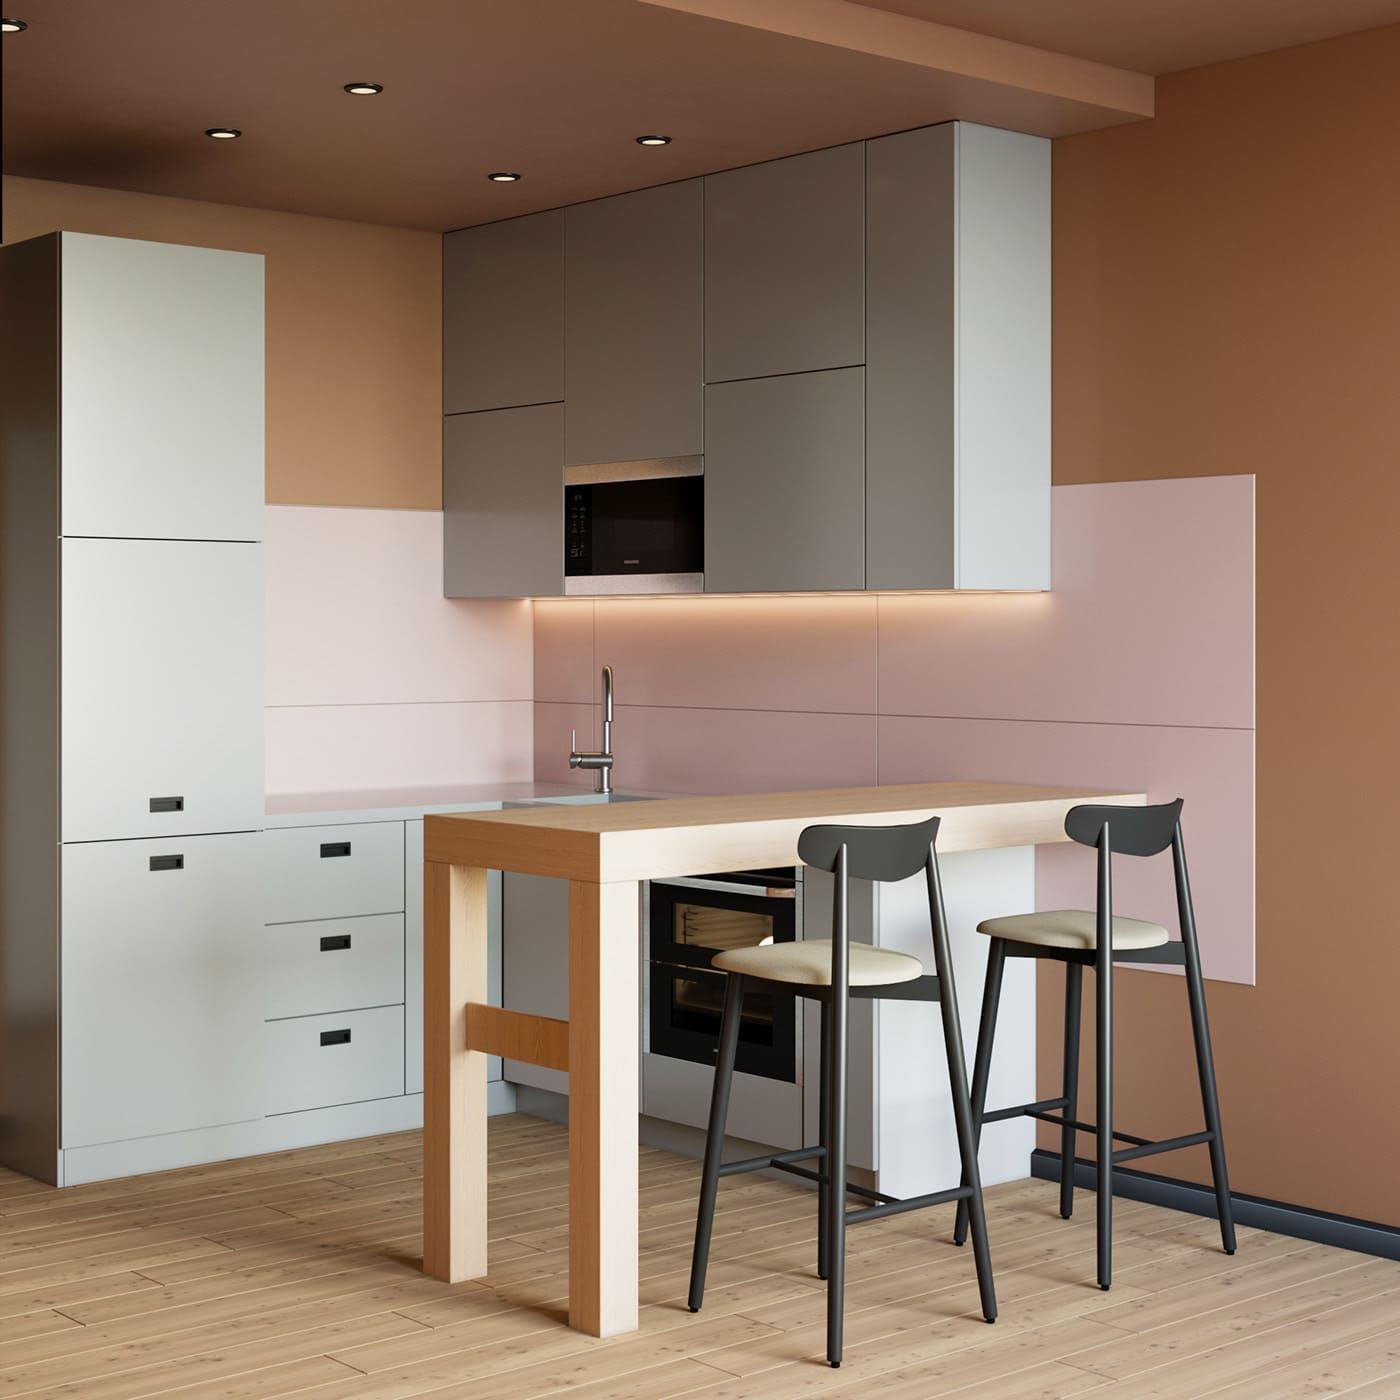 модный дизайн интерьера квартиры фото 27